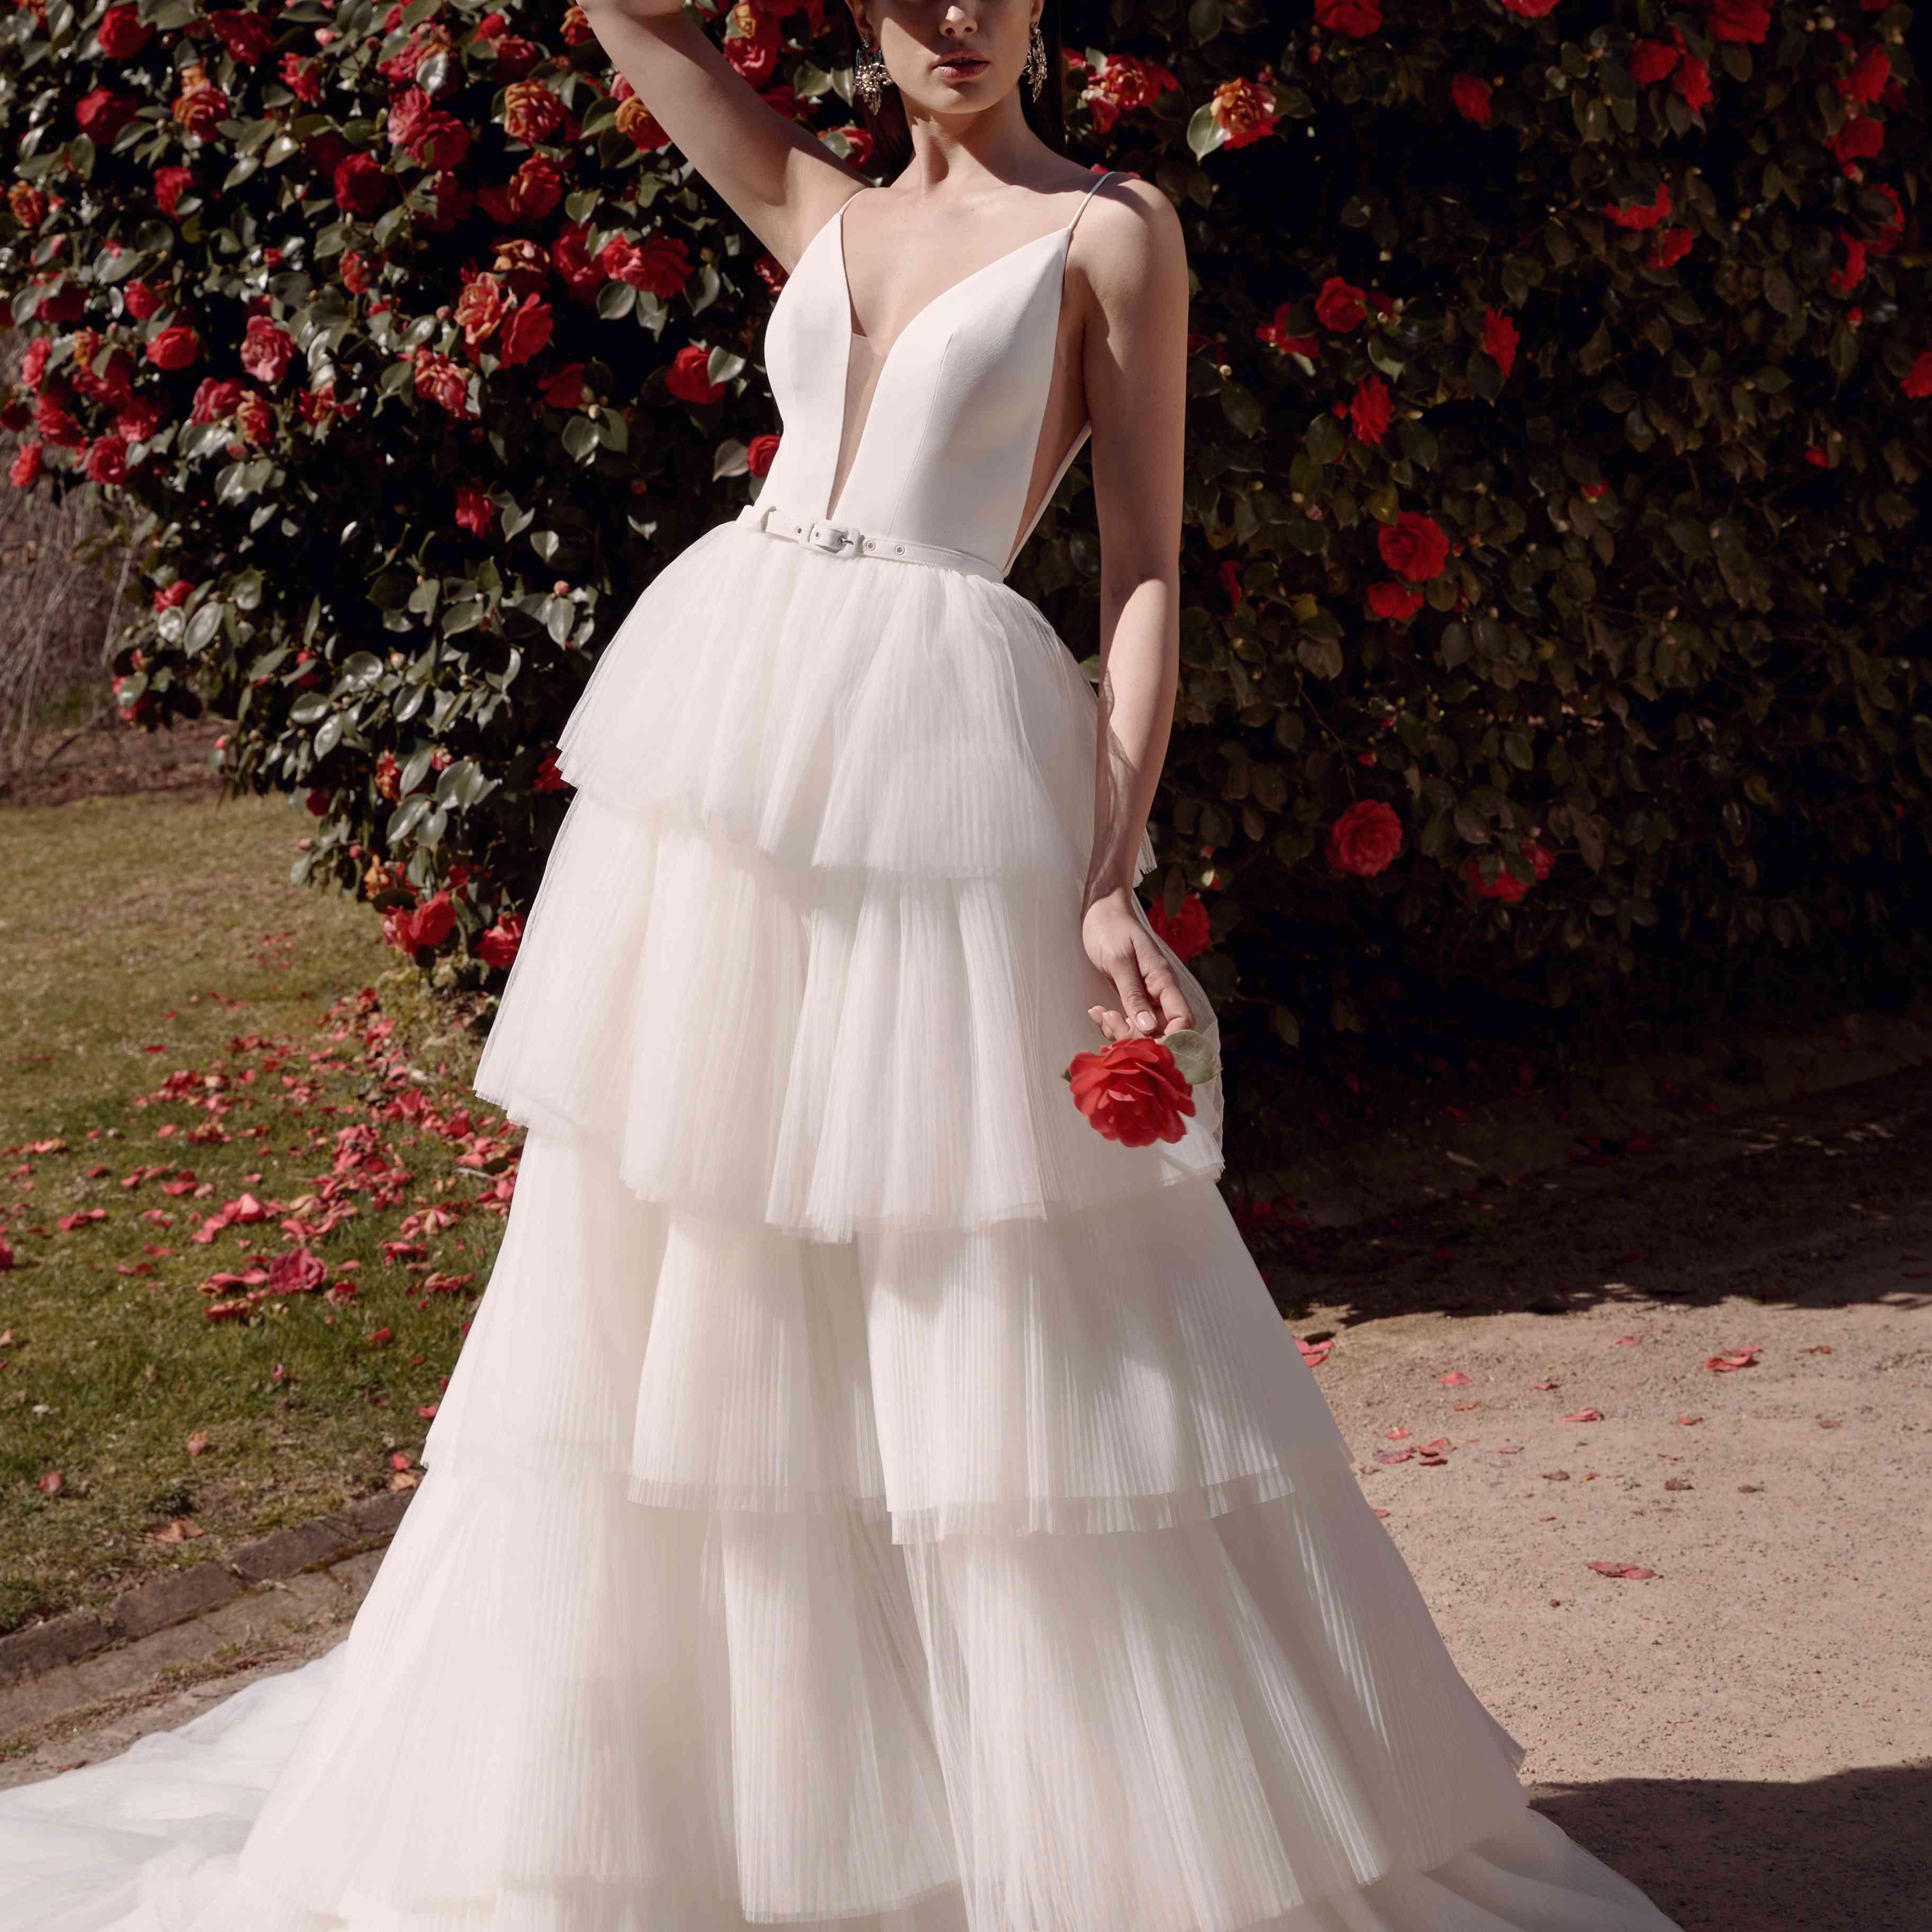 Remy tiered wedding skirt